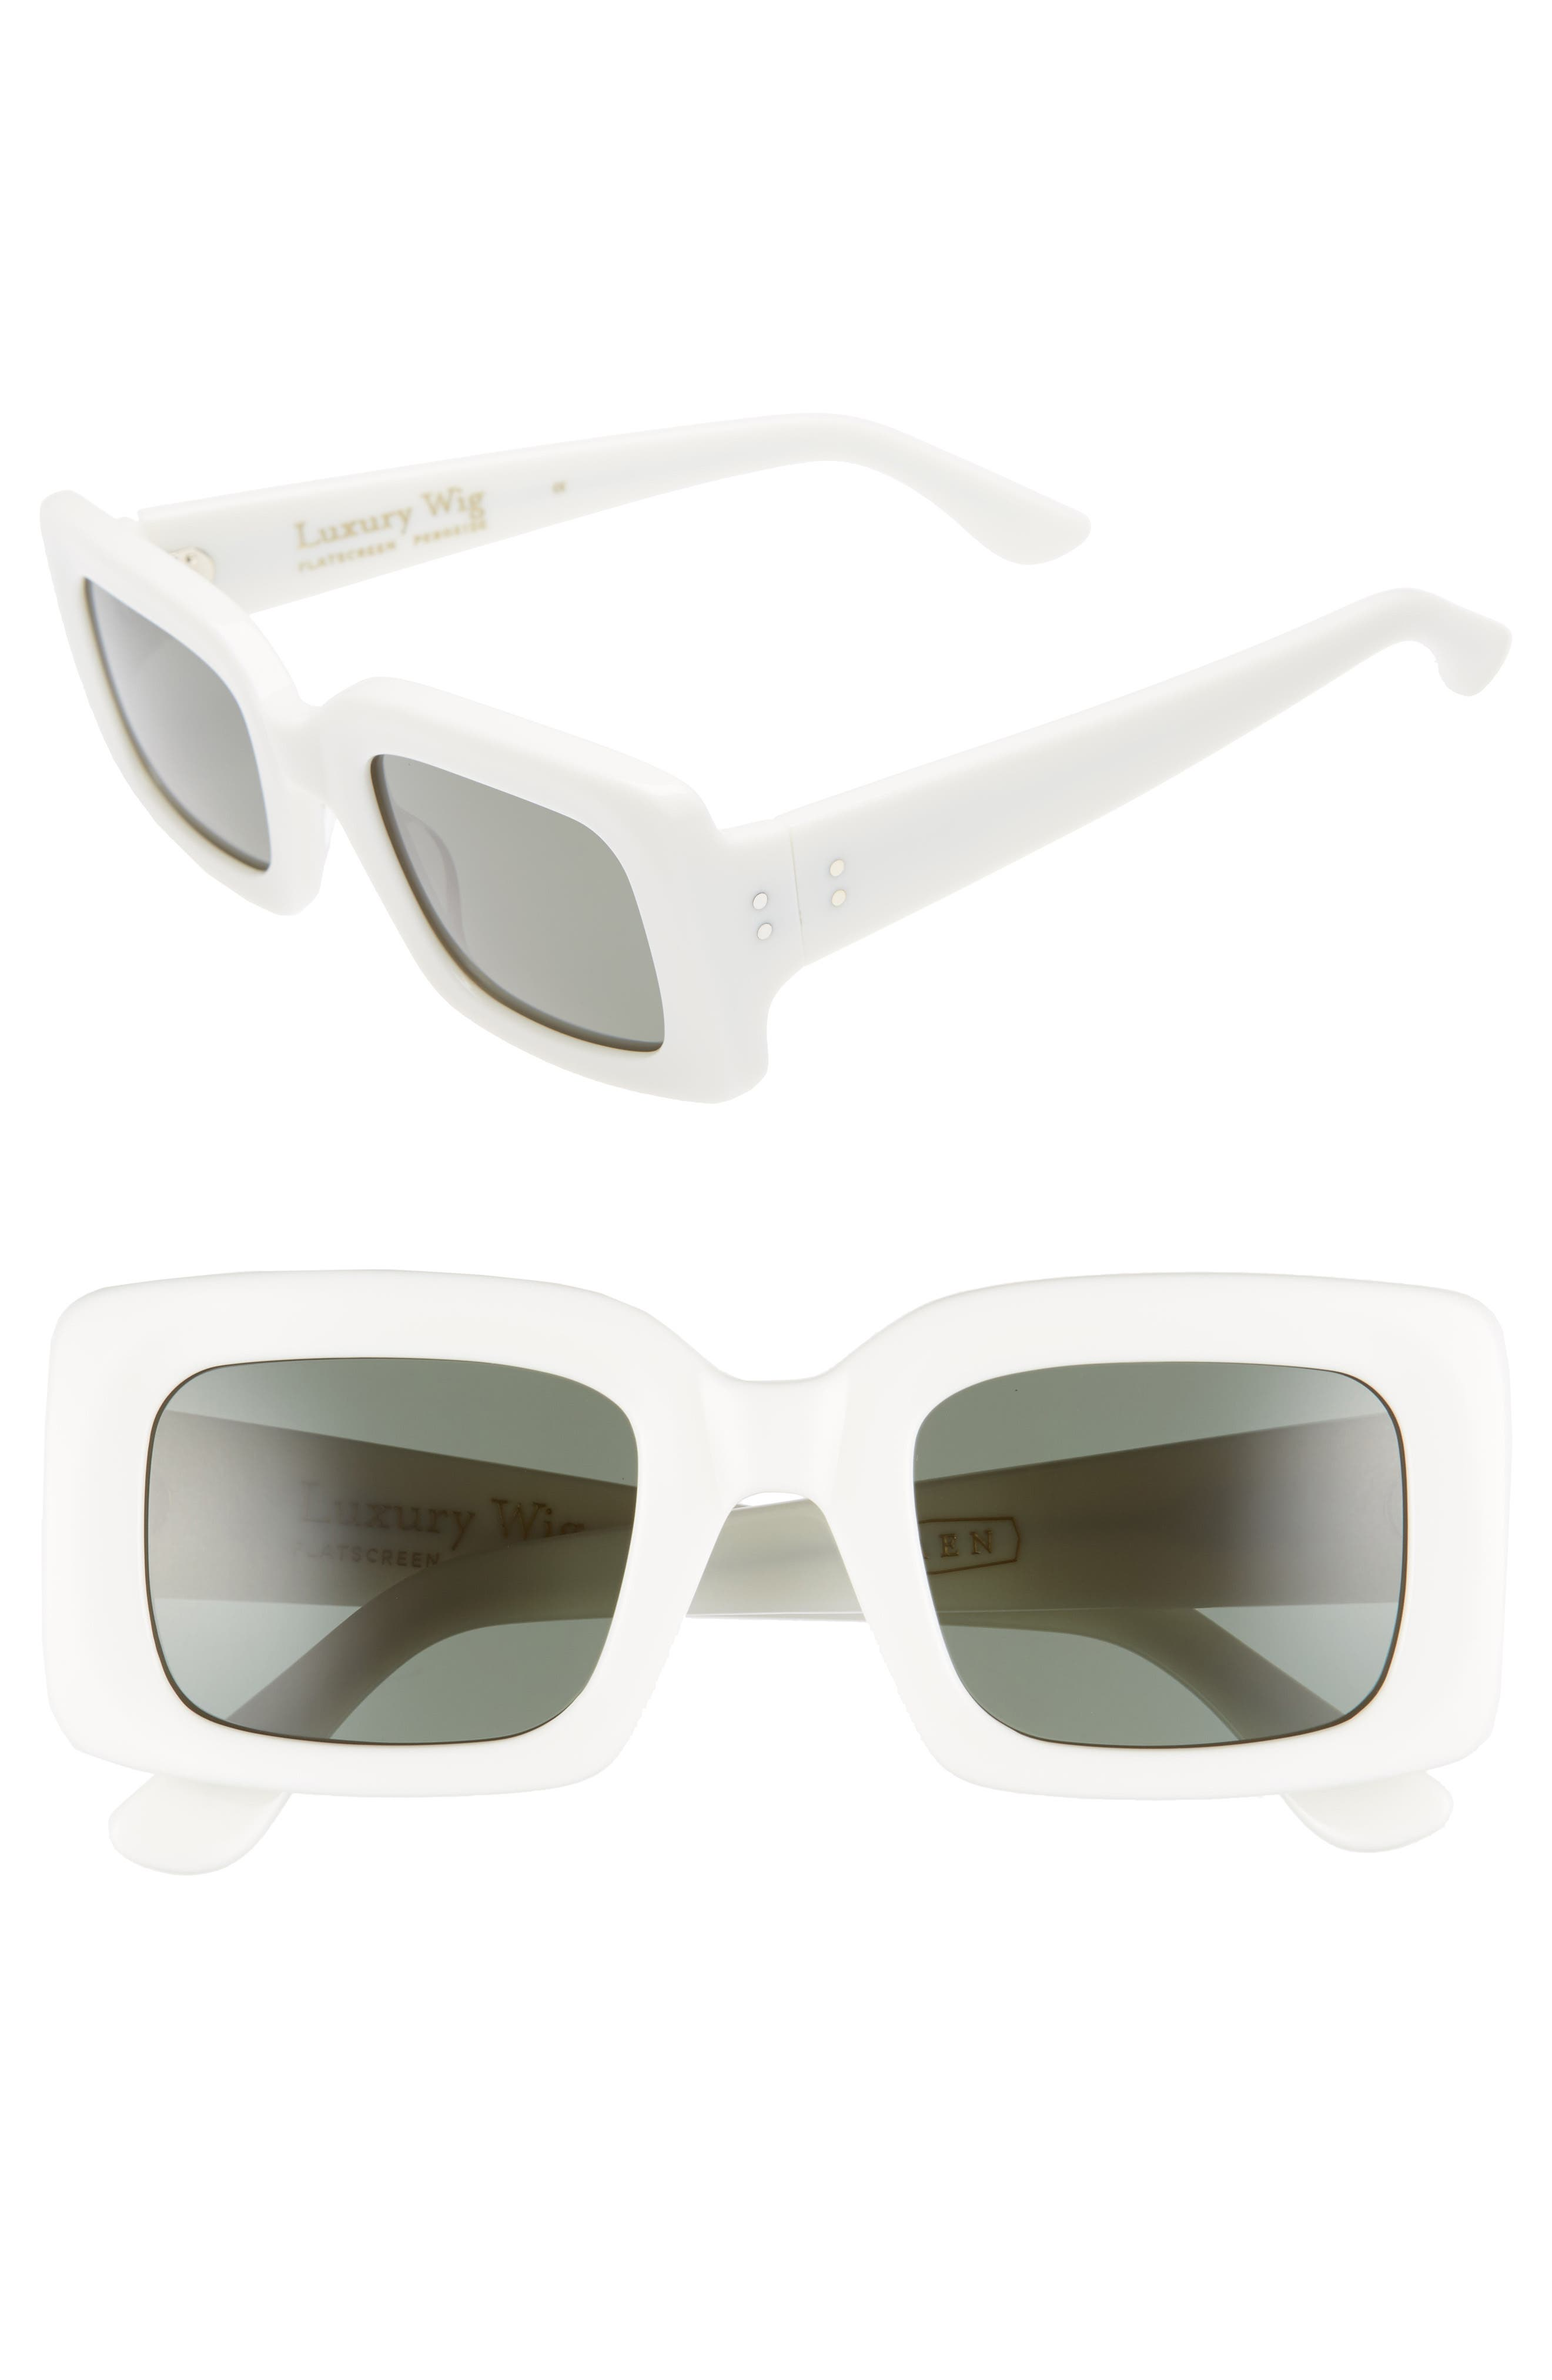 x Alex Knost Luxury Wig Flatscreen 49mm Square Sunglasses,                             Main thumbnail 1, color,                             PEROXIDE